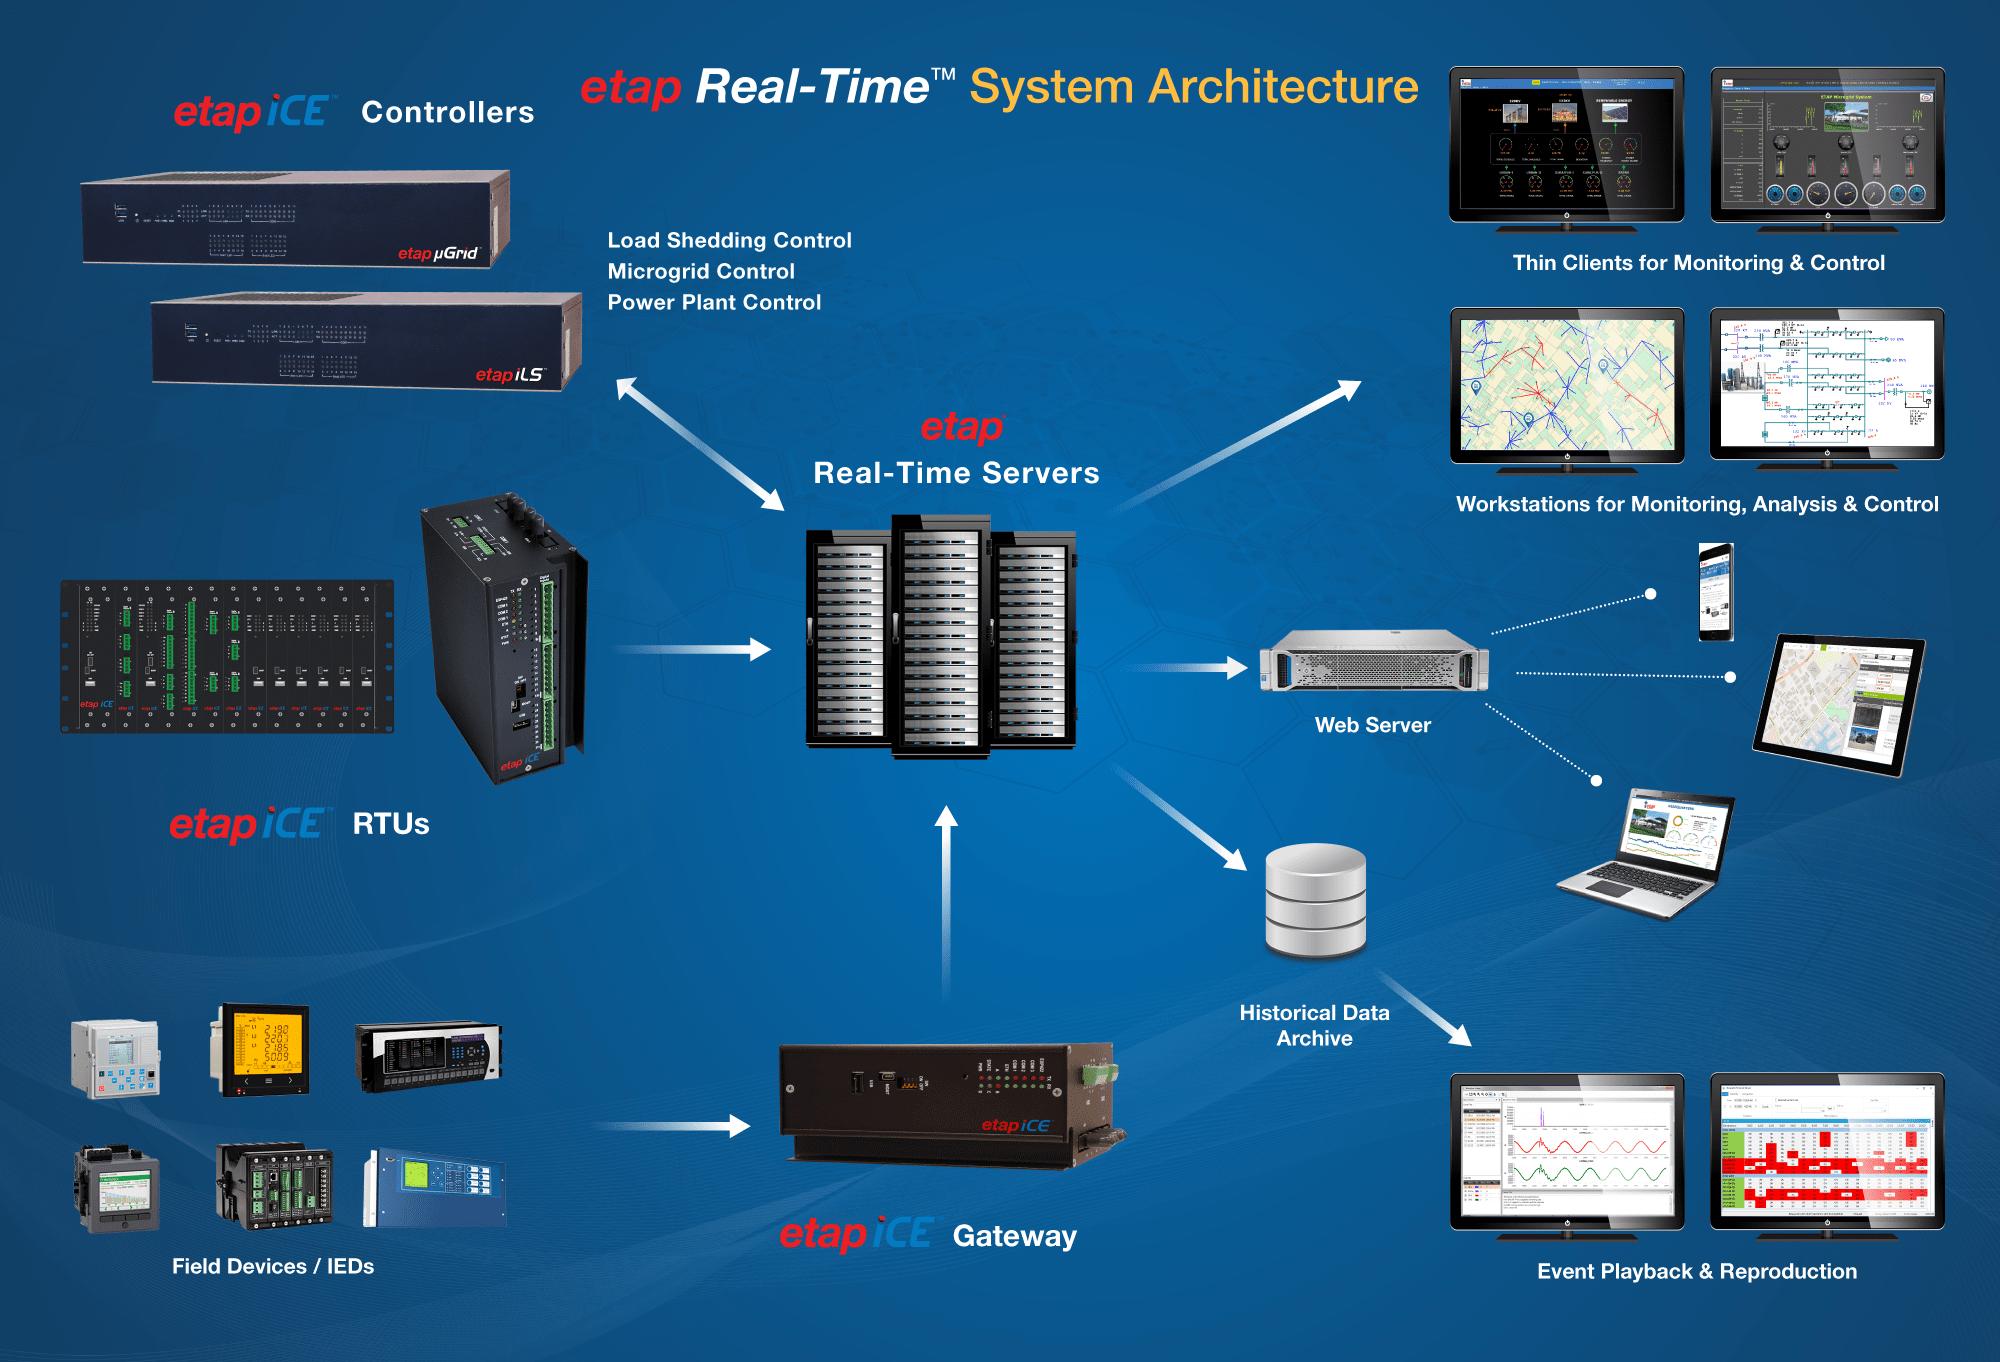 etap iCE Communication Architecture Diagram